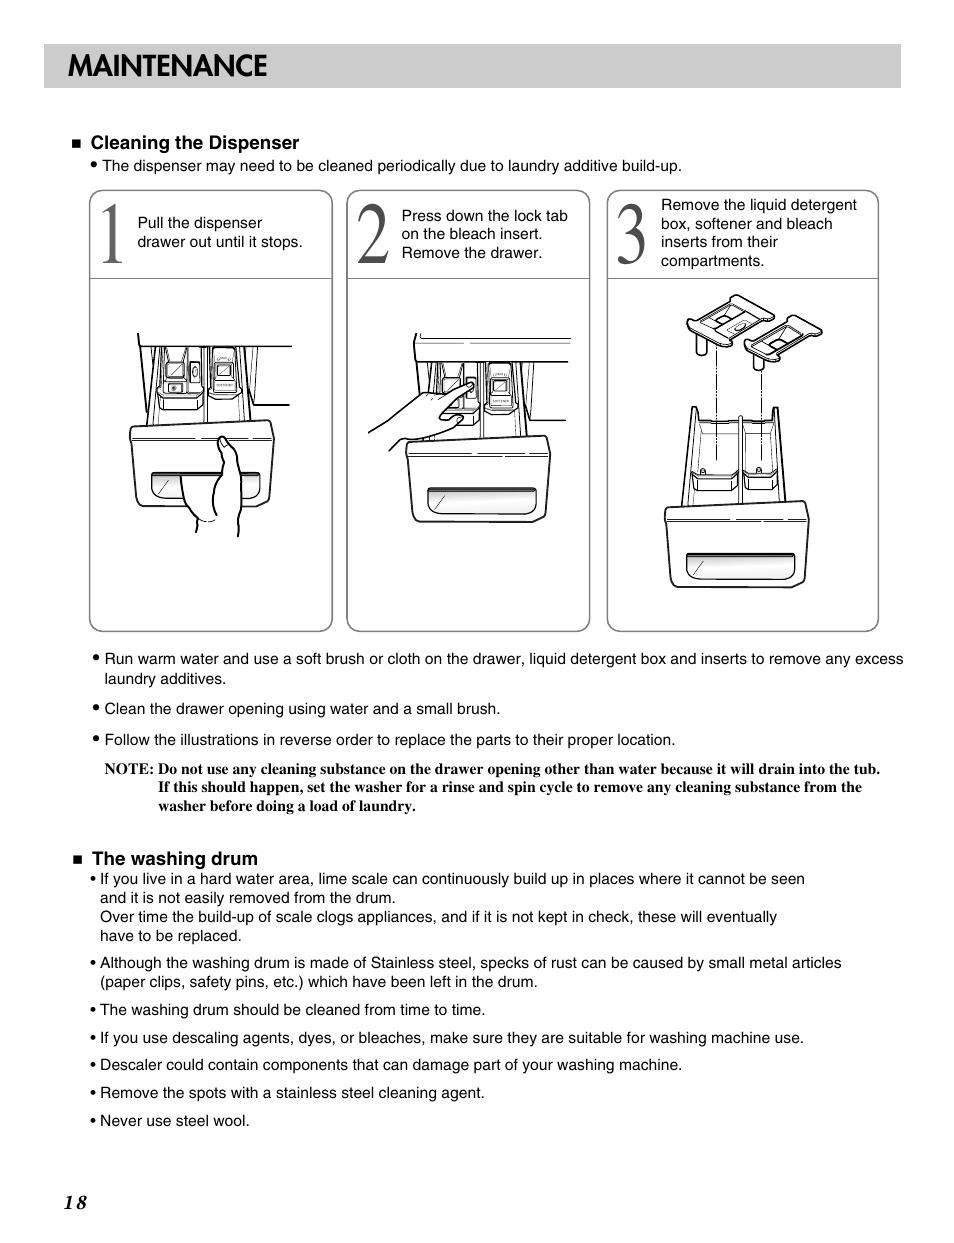 Maintenance | LG WM2016CW User Manual | Page 19 / 48